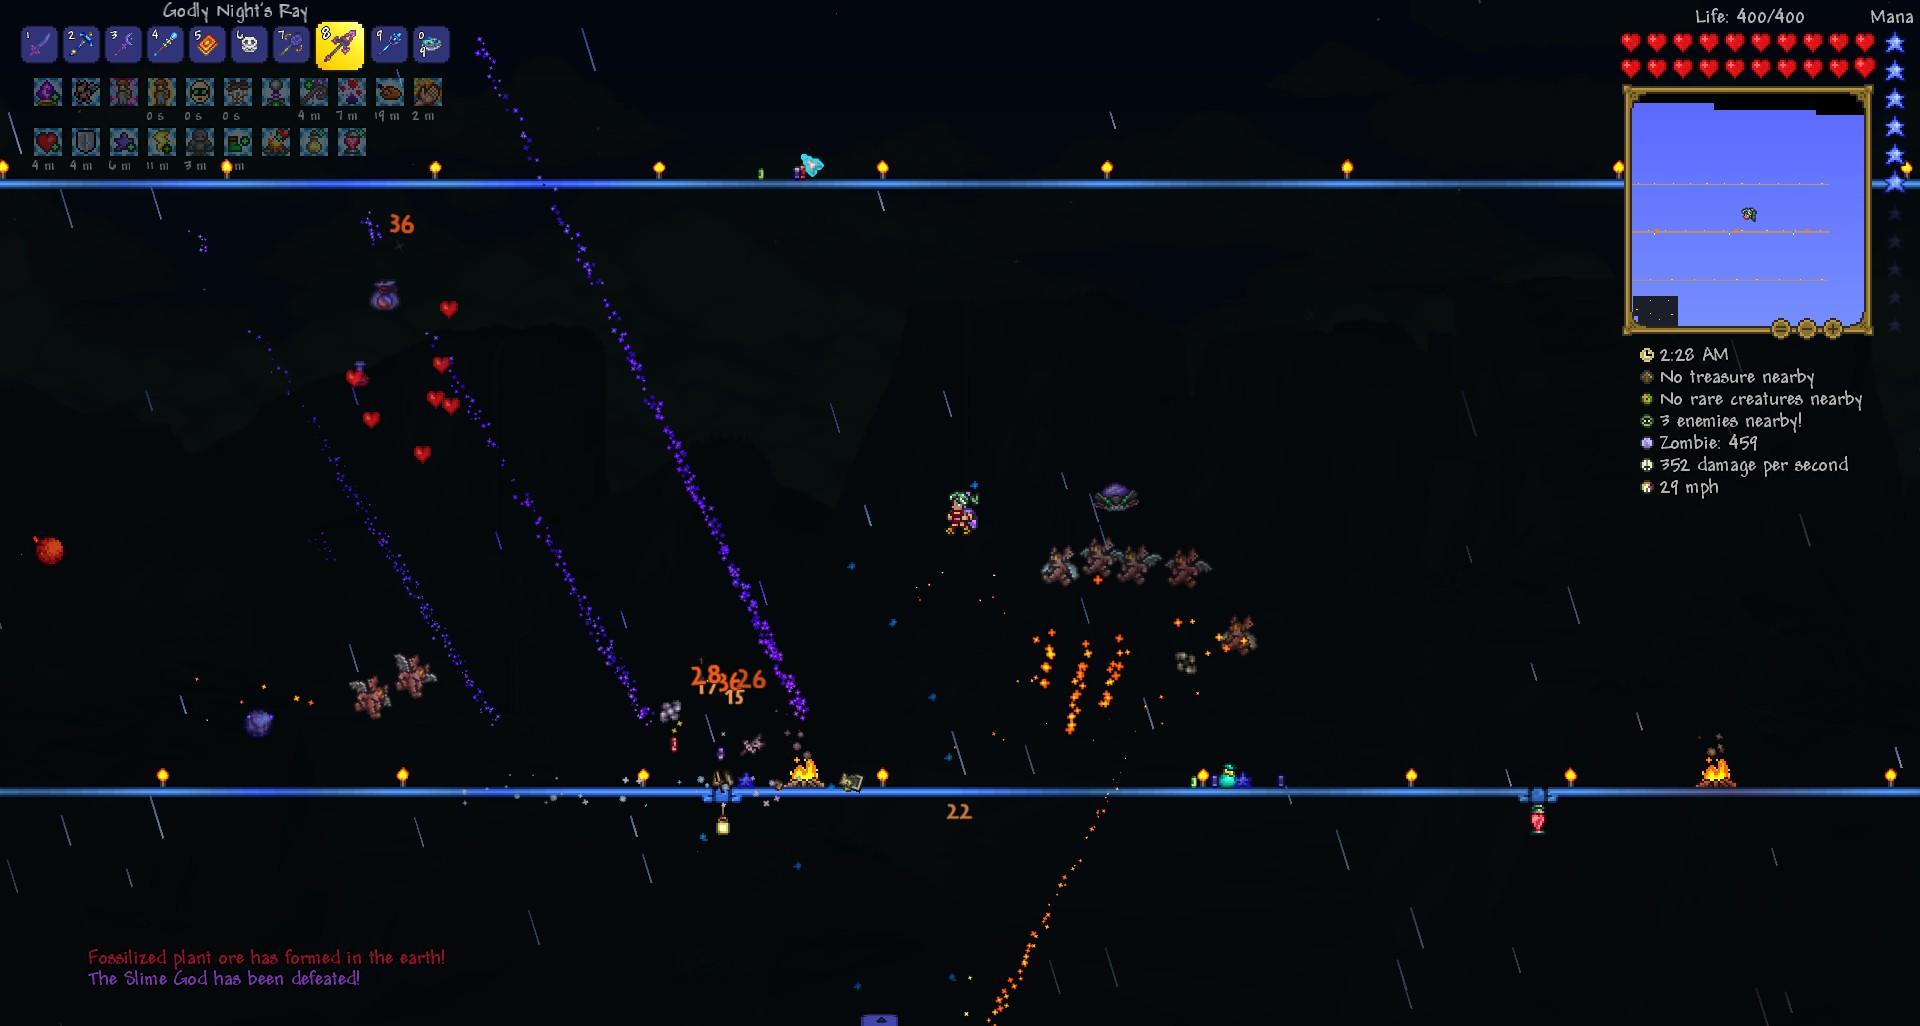 Terraria calamity mod soundtrack download | Official Thorium Mod